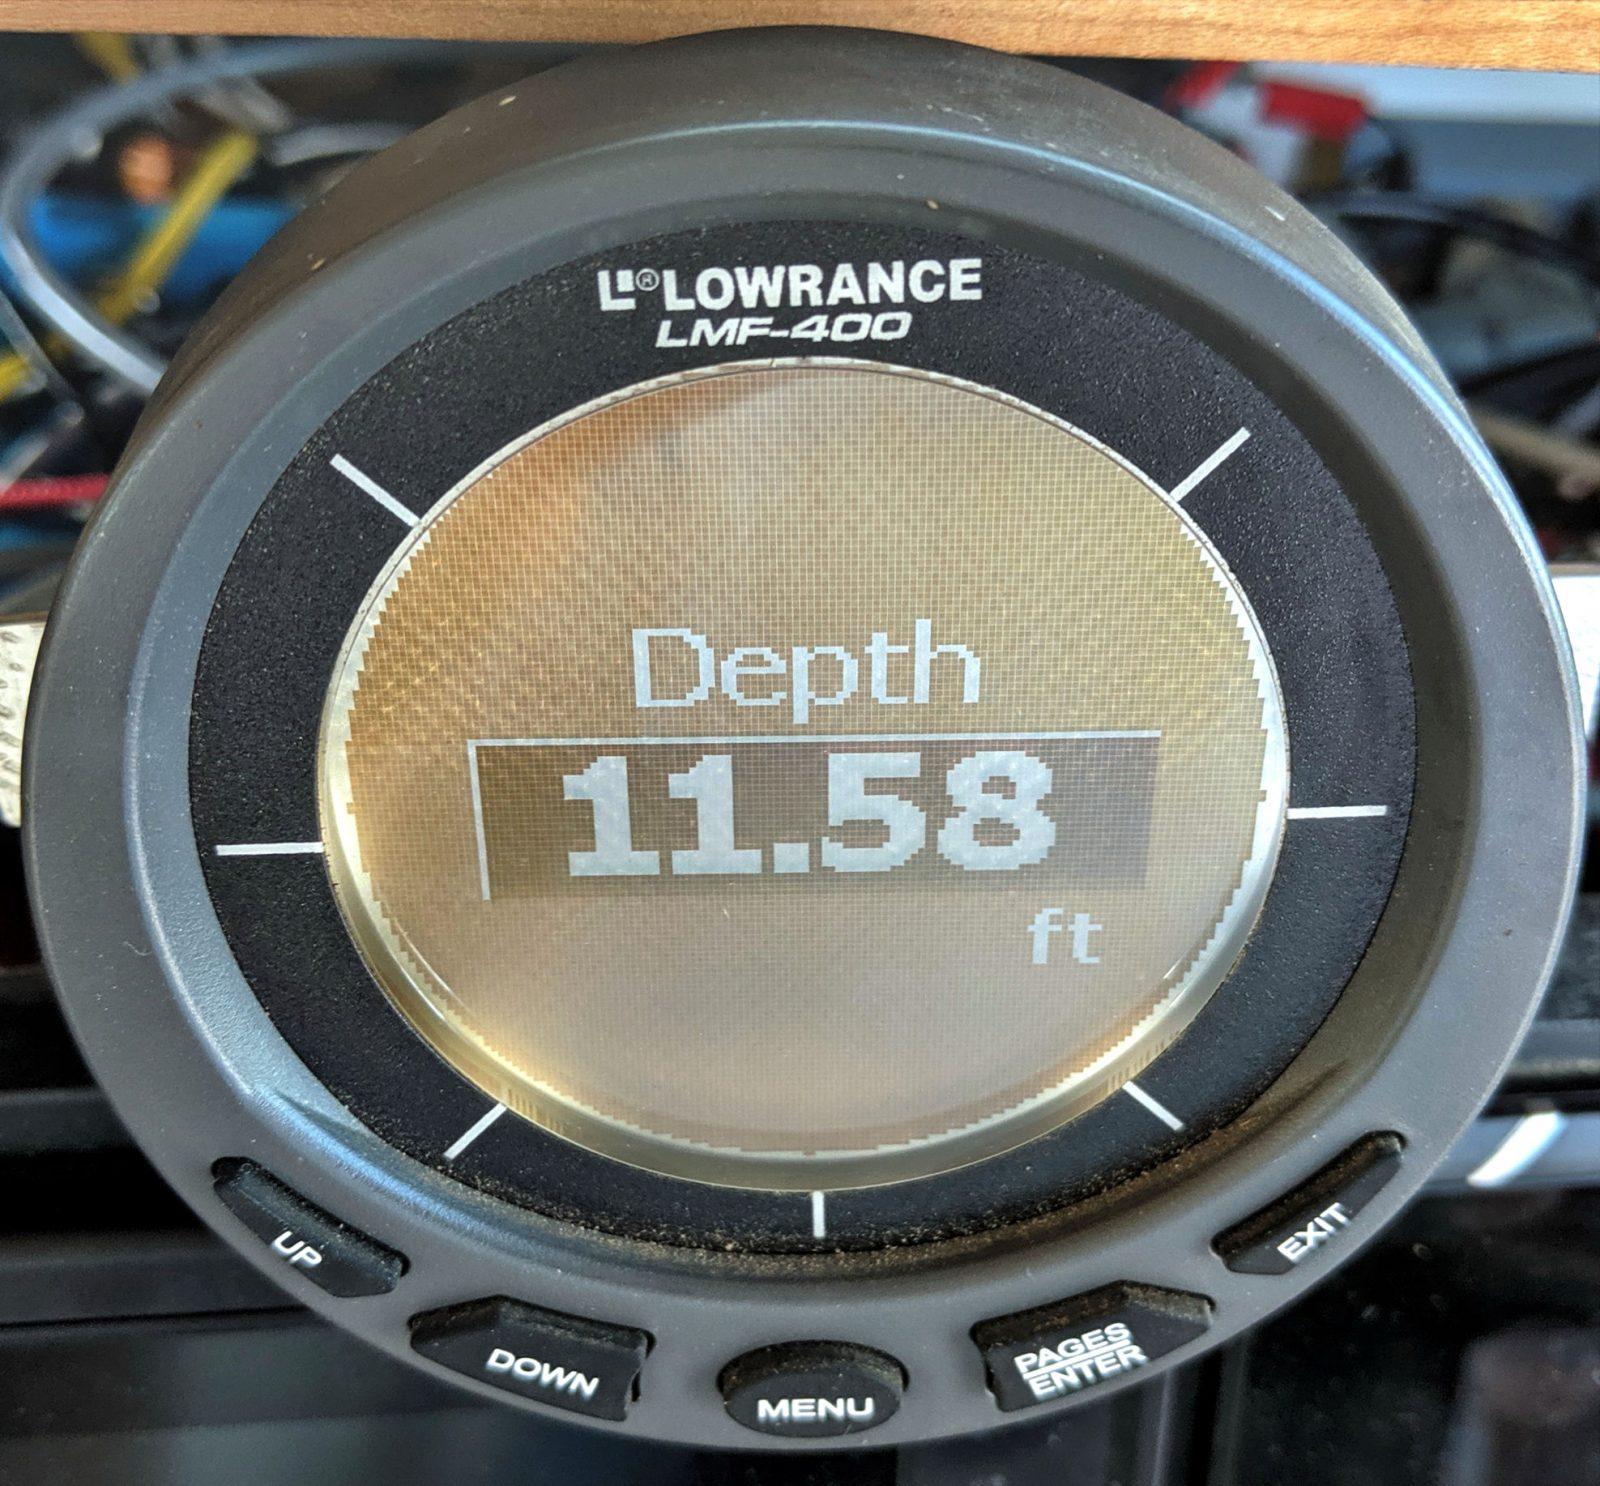 Lowrance LMF-400 showing NMEA 2000 Depth